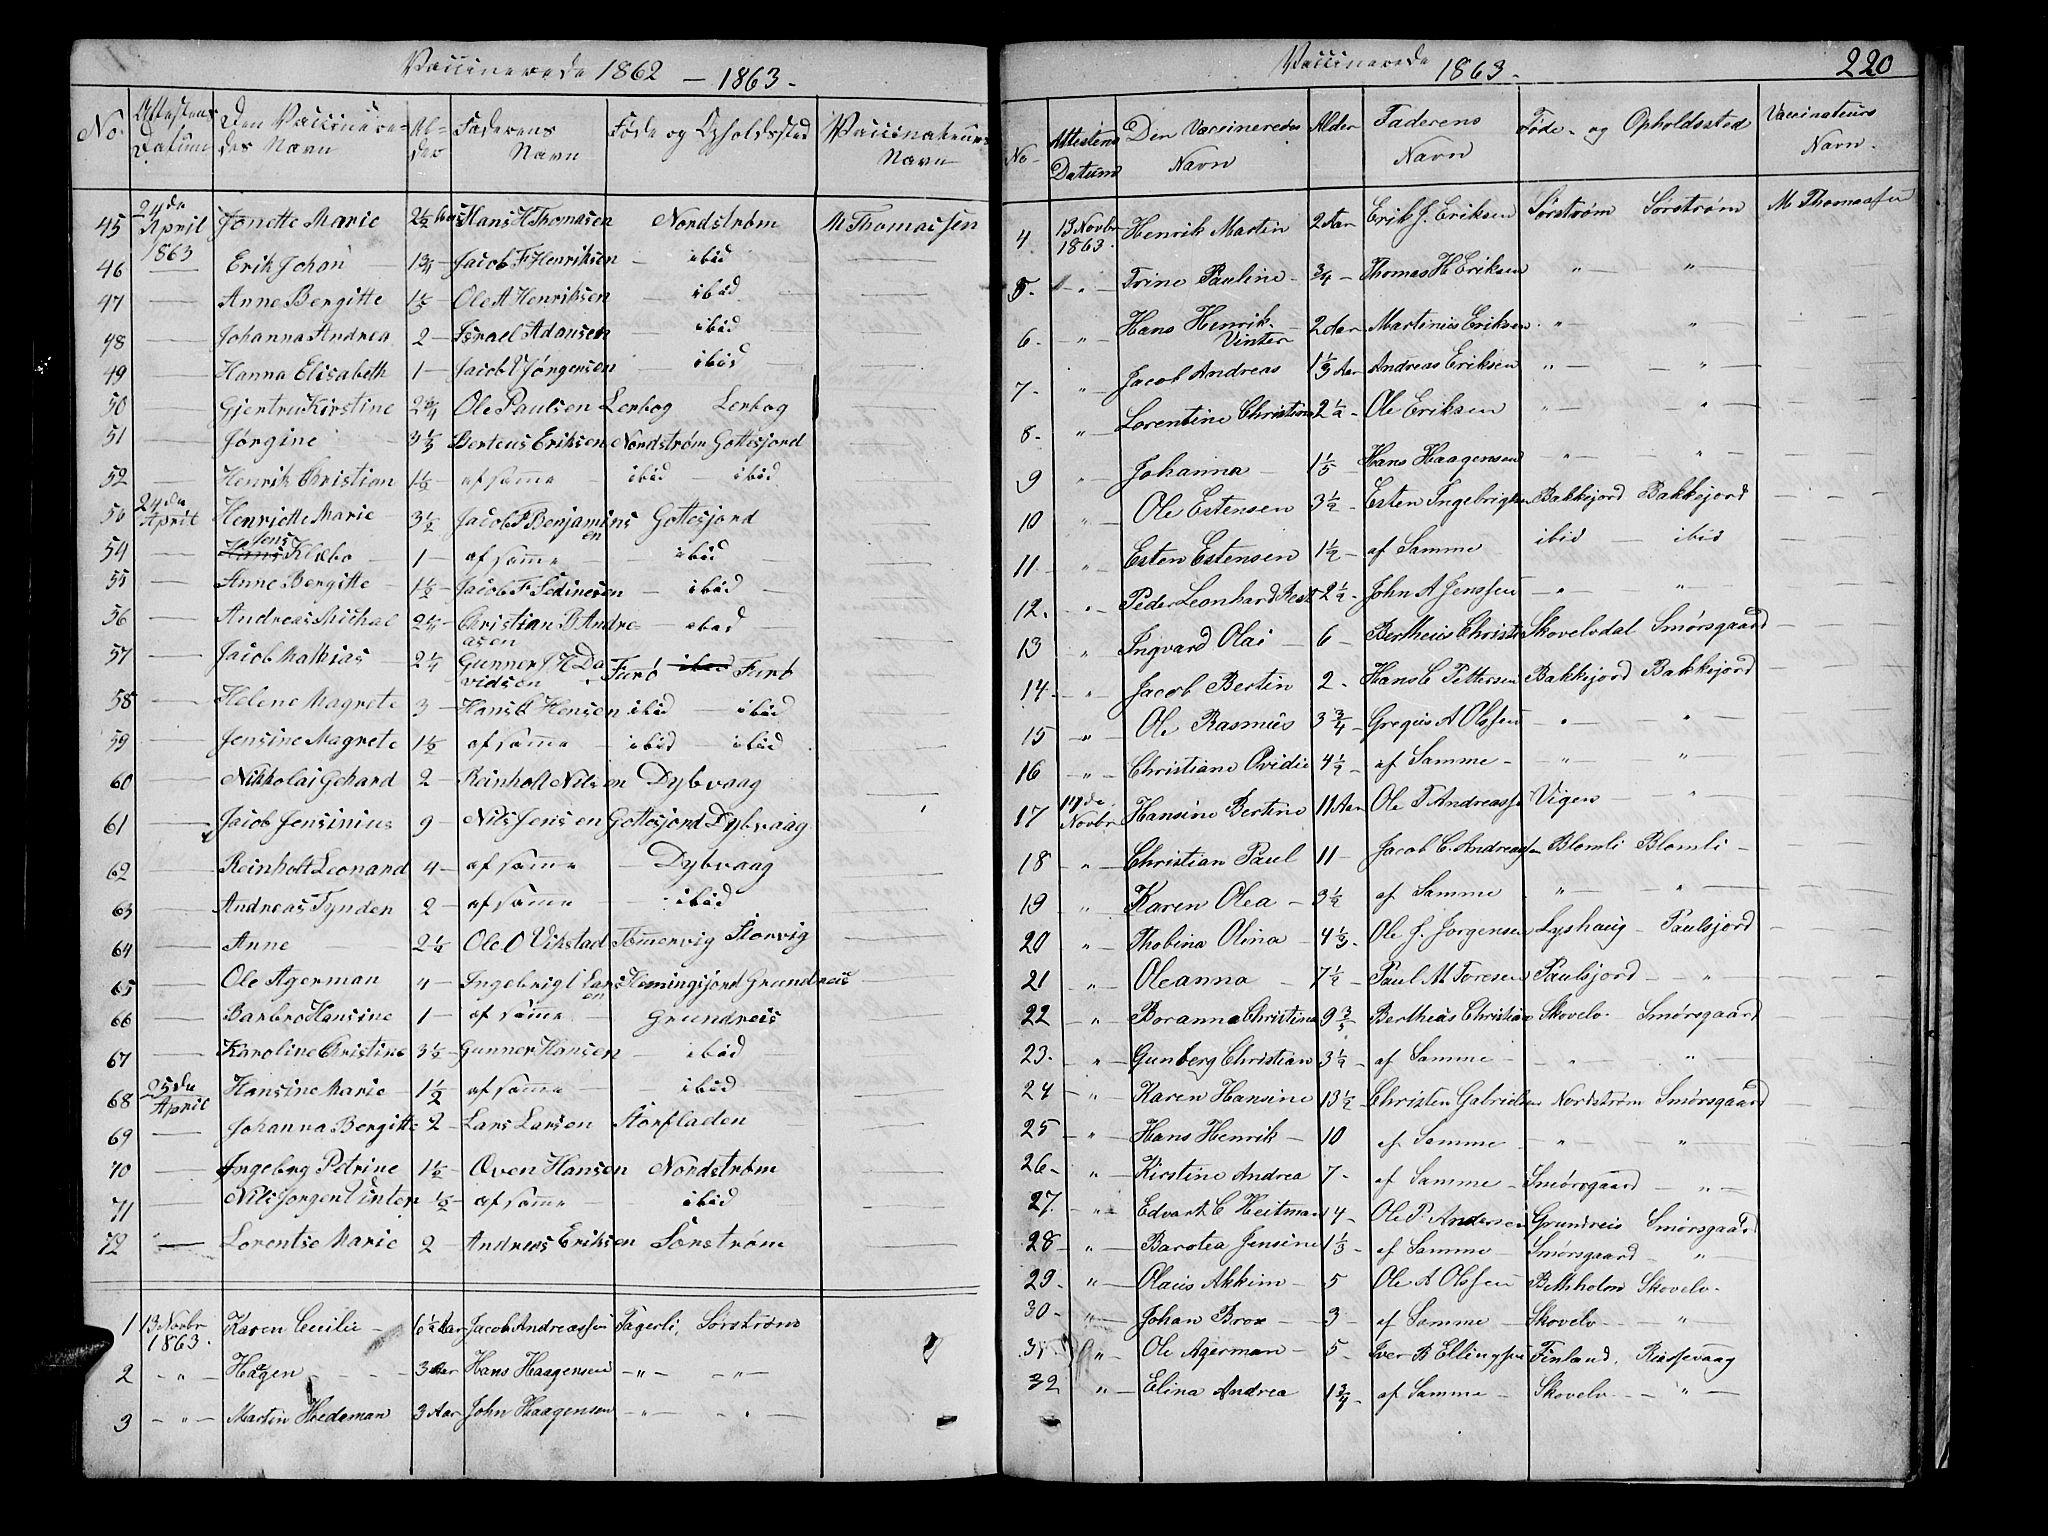 SATØ, Tranøy sokneprestkontor, I/Ia/Iab/L0021klokker: Parish register (copy) no. 21, 1861-1886, p. 220